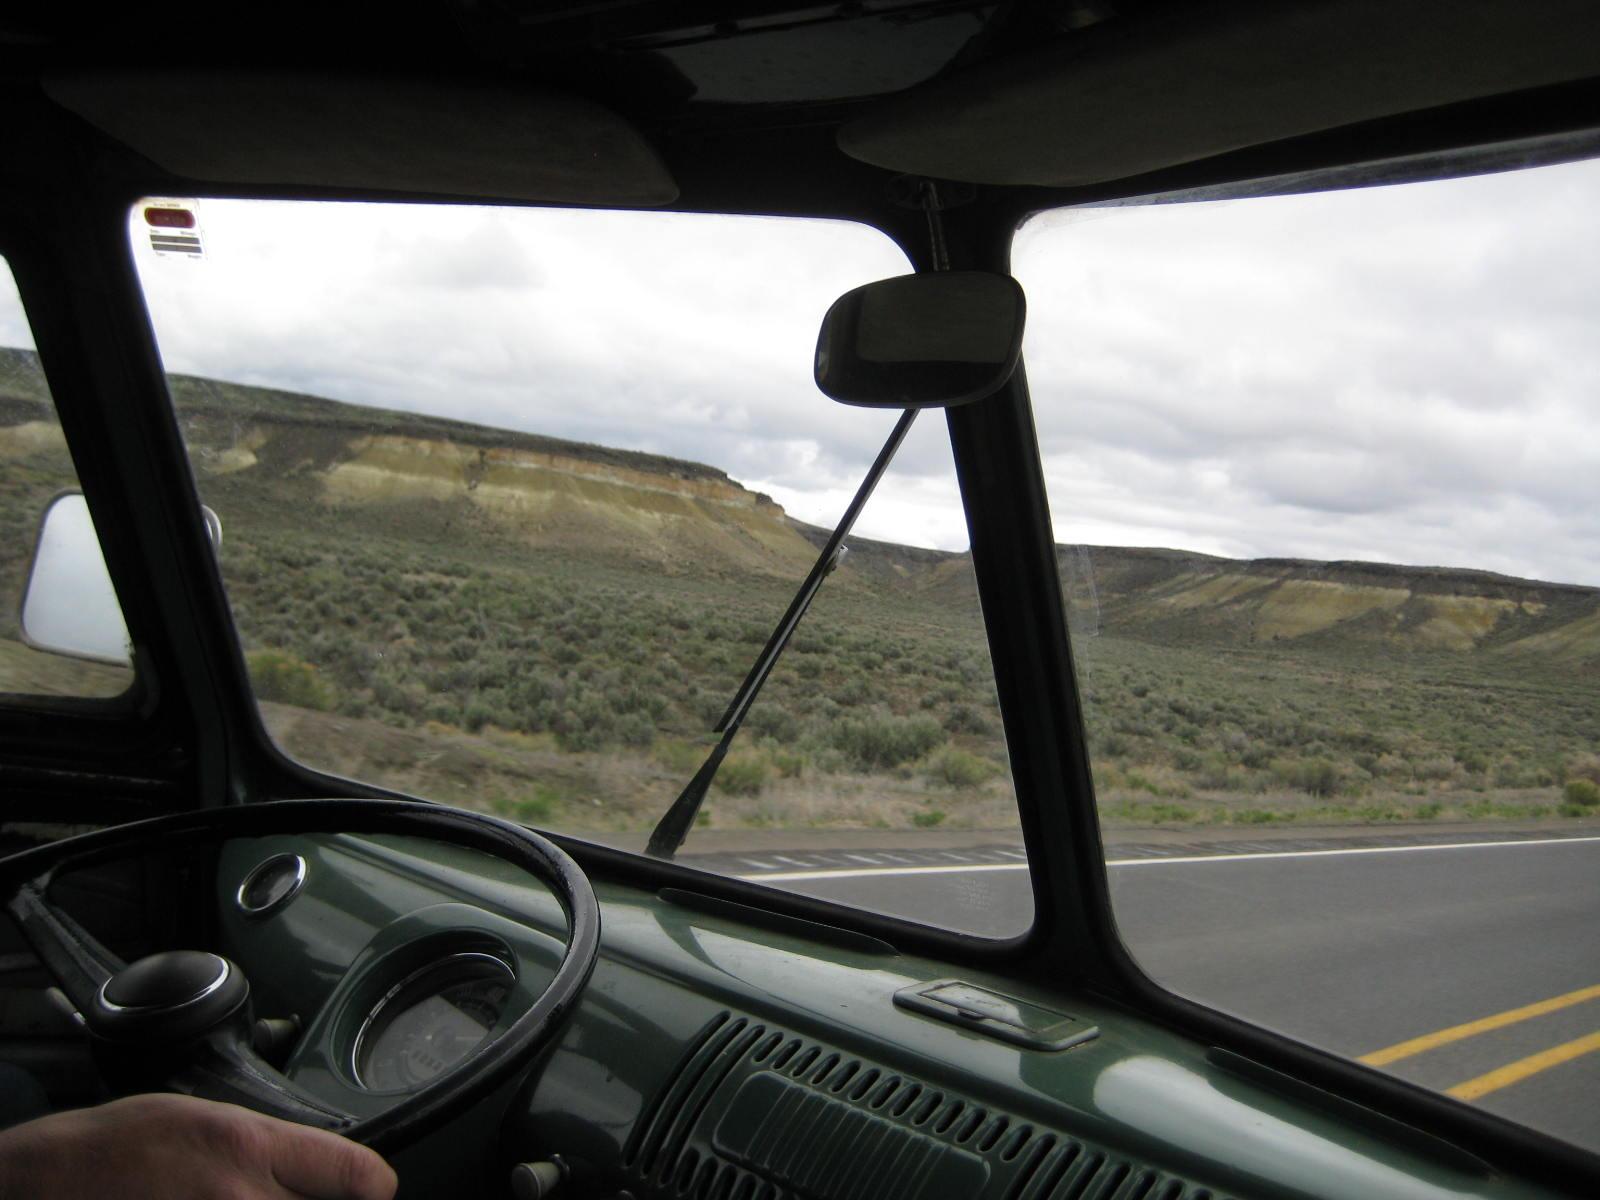 Eastern Oregon sagebrush & hills with erosion